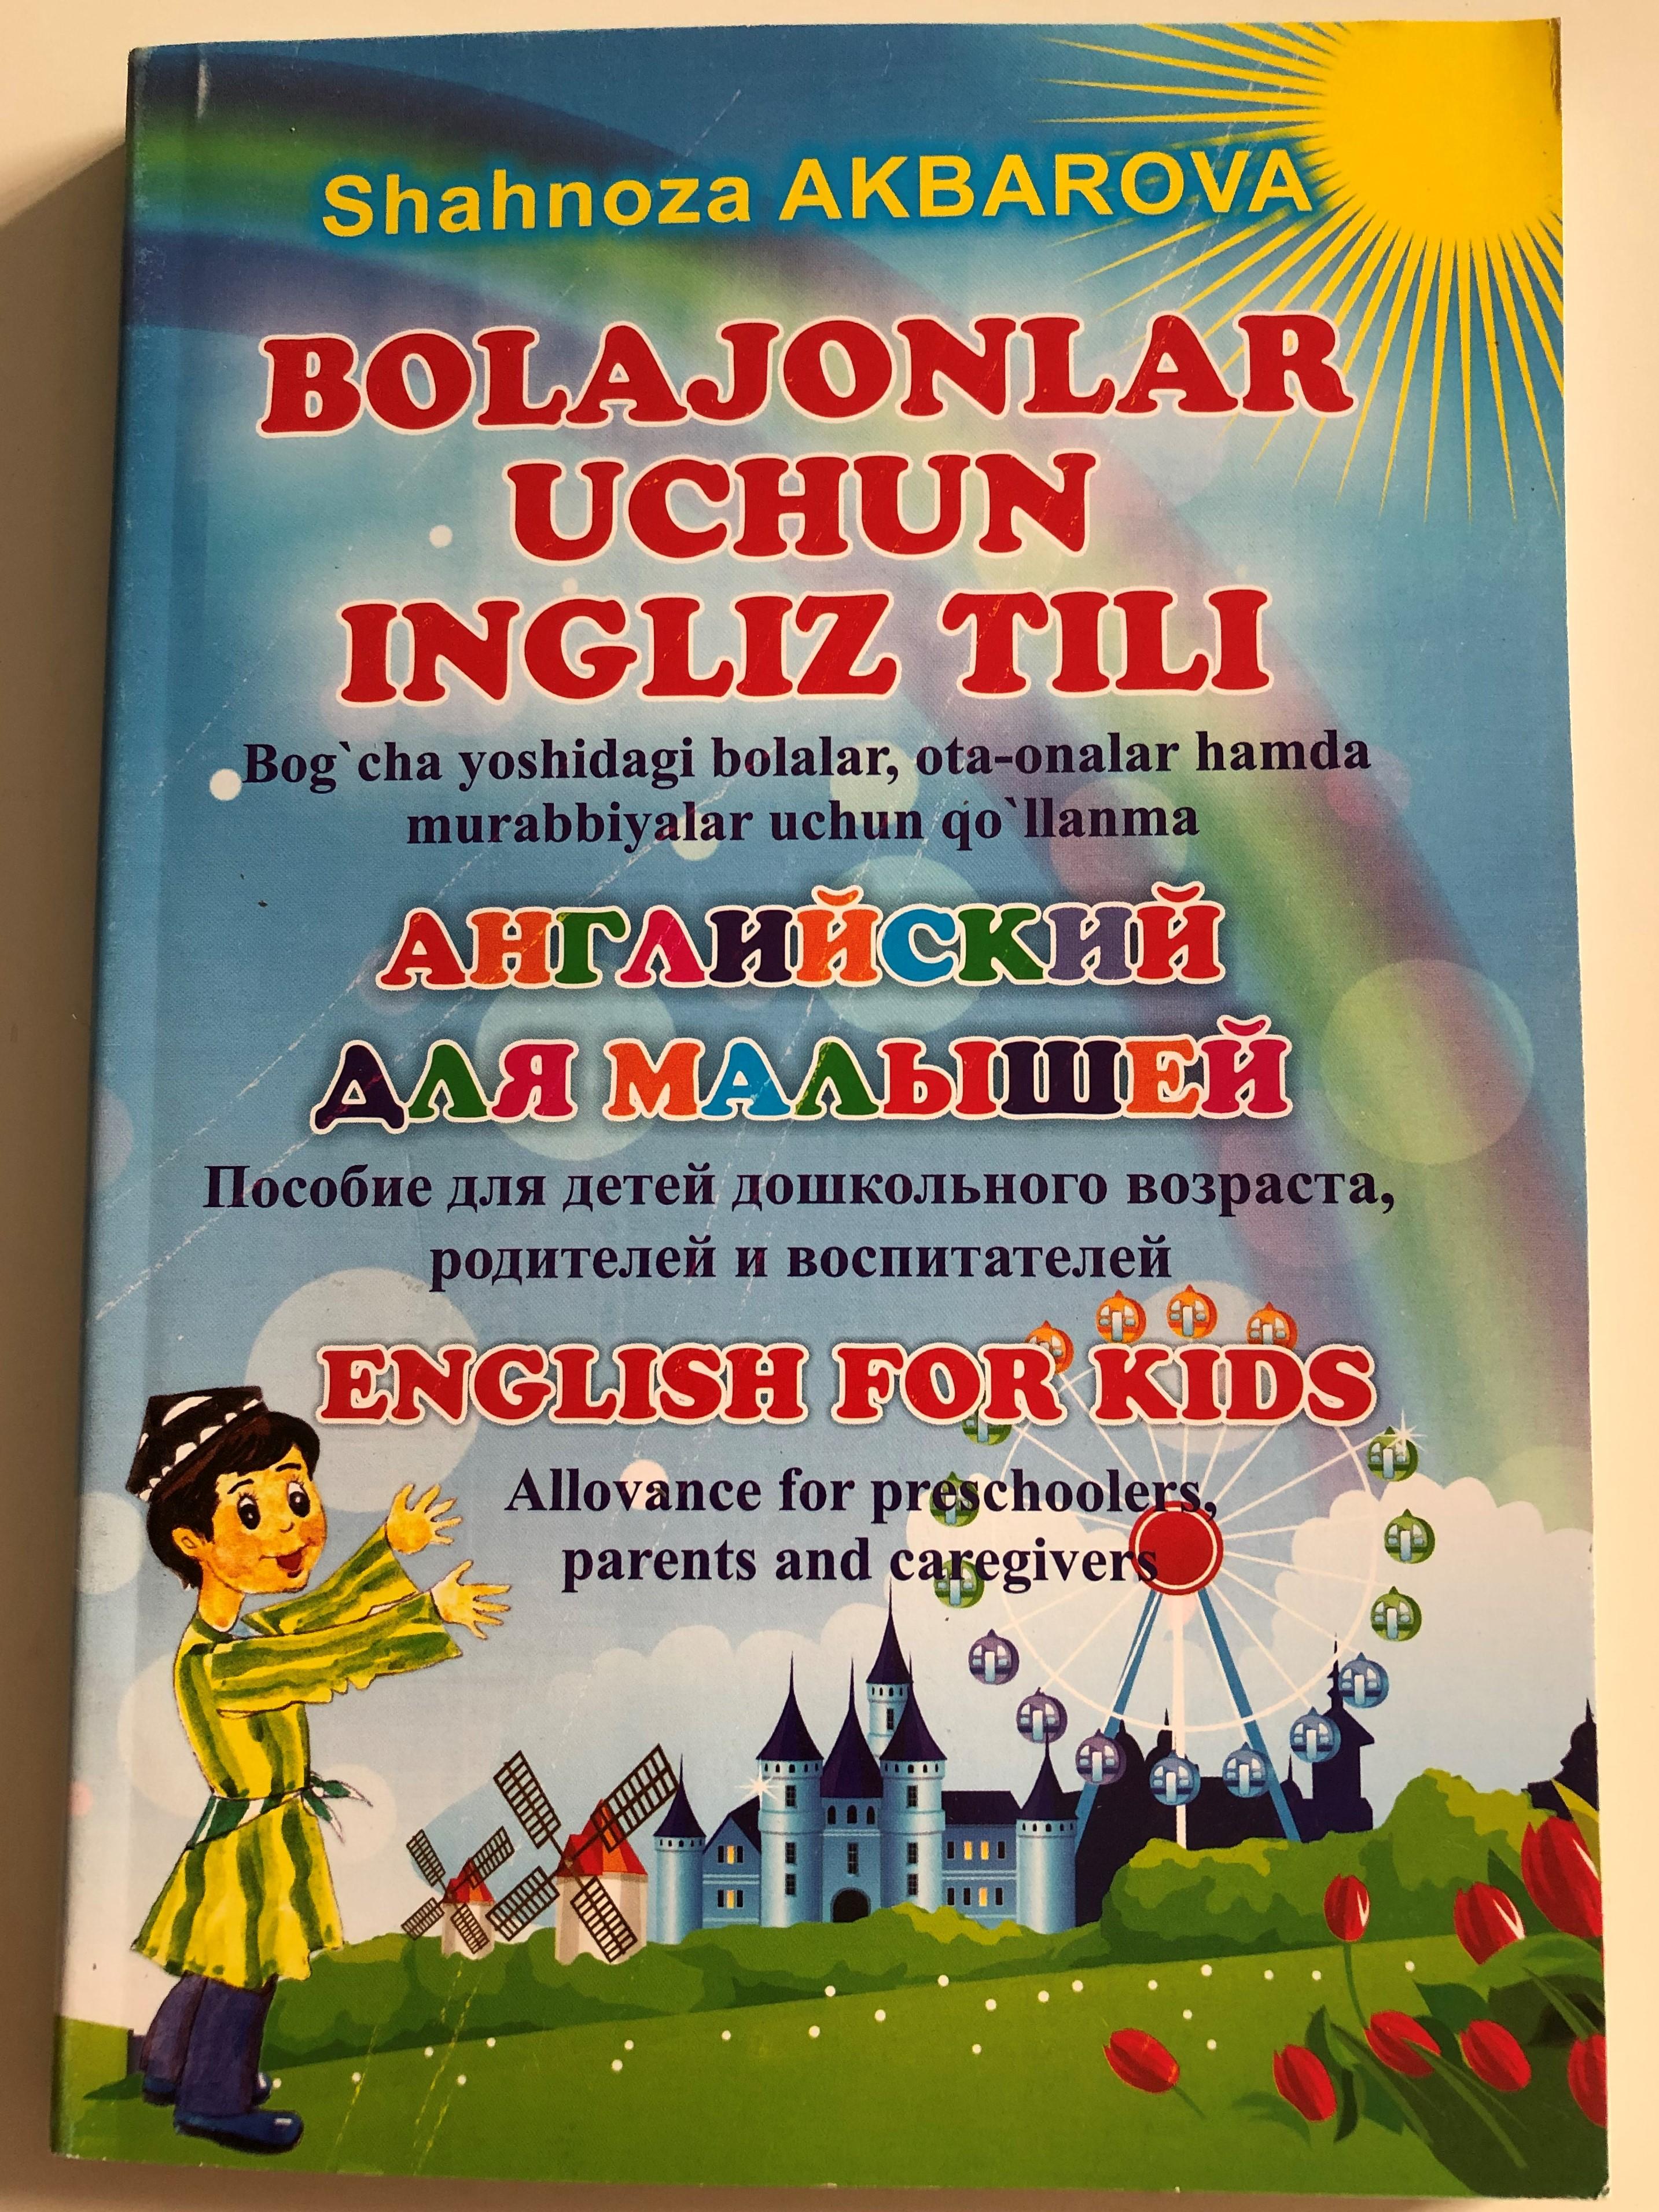 bolajonlar-uchun-ingliz-tili-by-shahnoza-akbarova-english-for-kids-allovance-for-preschoolers-parents-and-caregivers-uzbek-russian-english-learning-book-paperback-color-pages-ijod-press-2017-1-.jpg